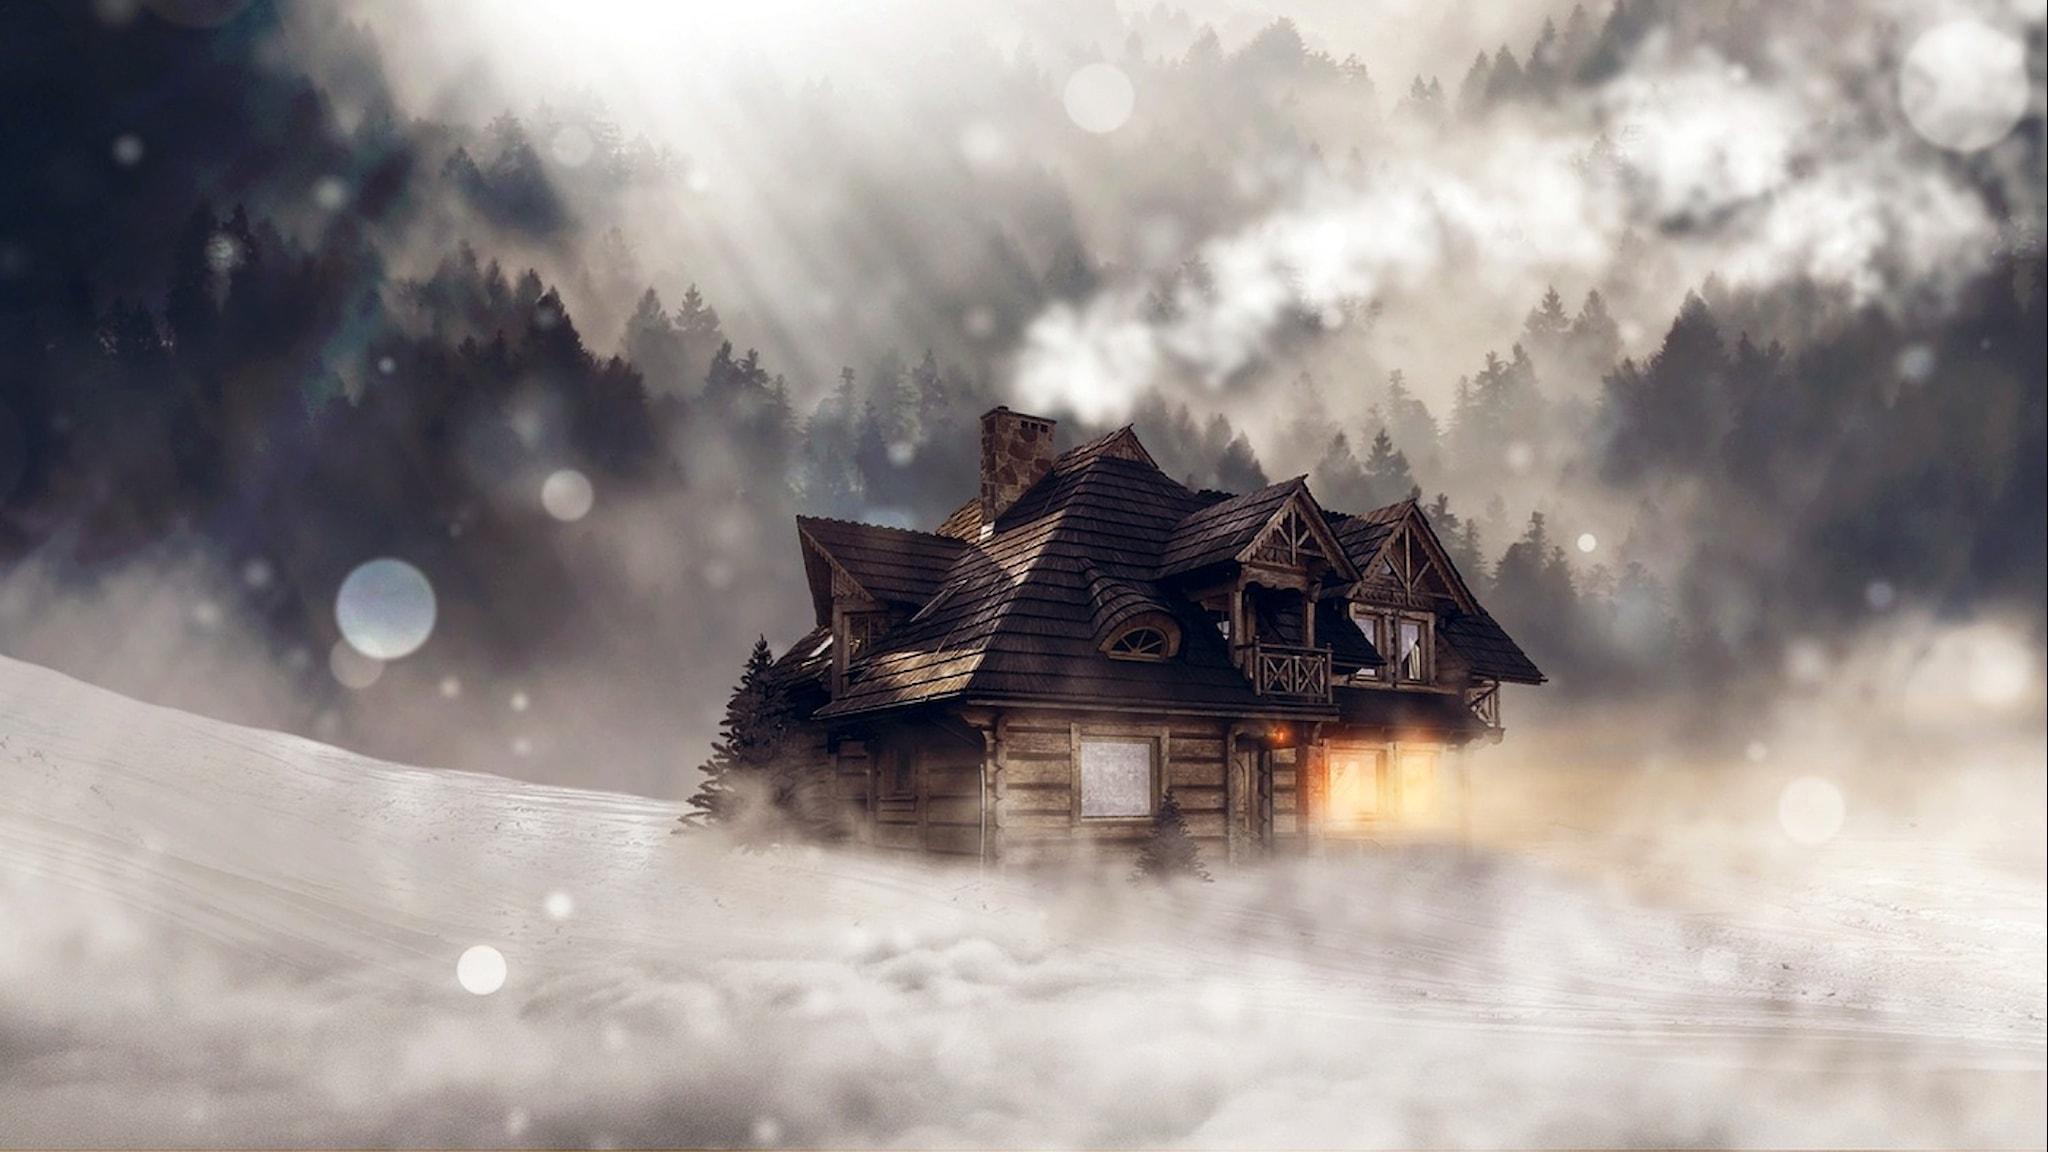 Stuga i snöstorm. Bild: Pixabay